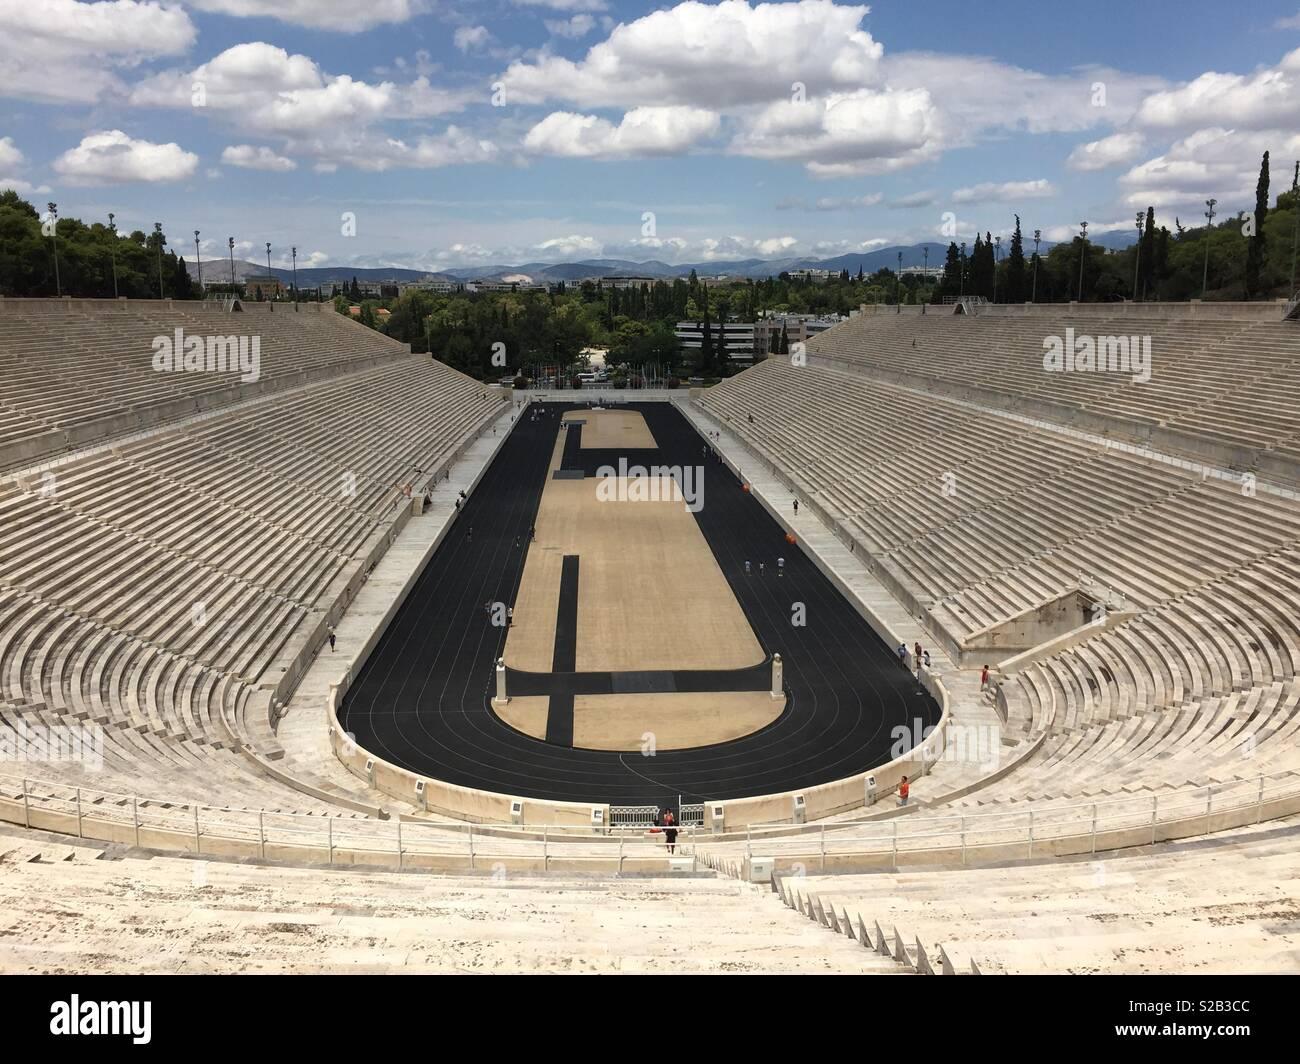 Kalimarmaro stadium in Athens, Greece Stock Photo